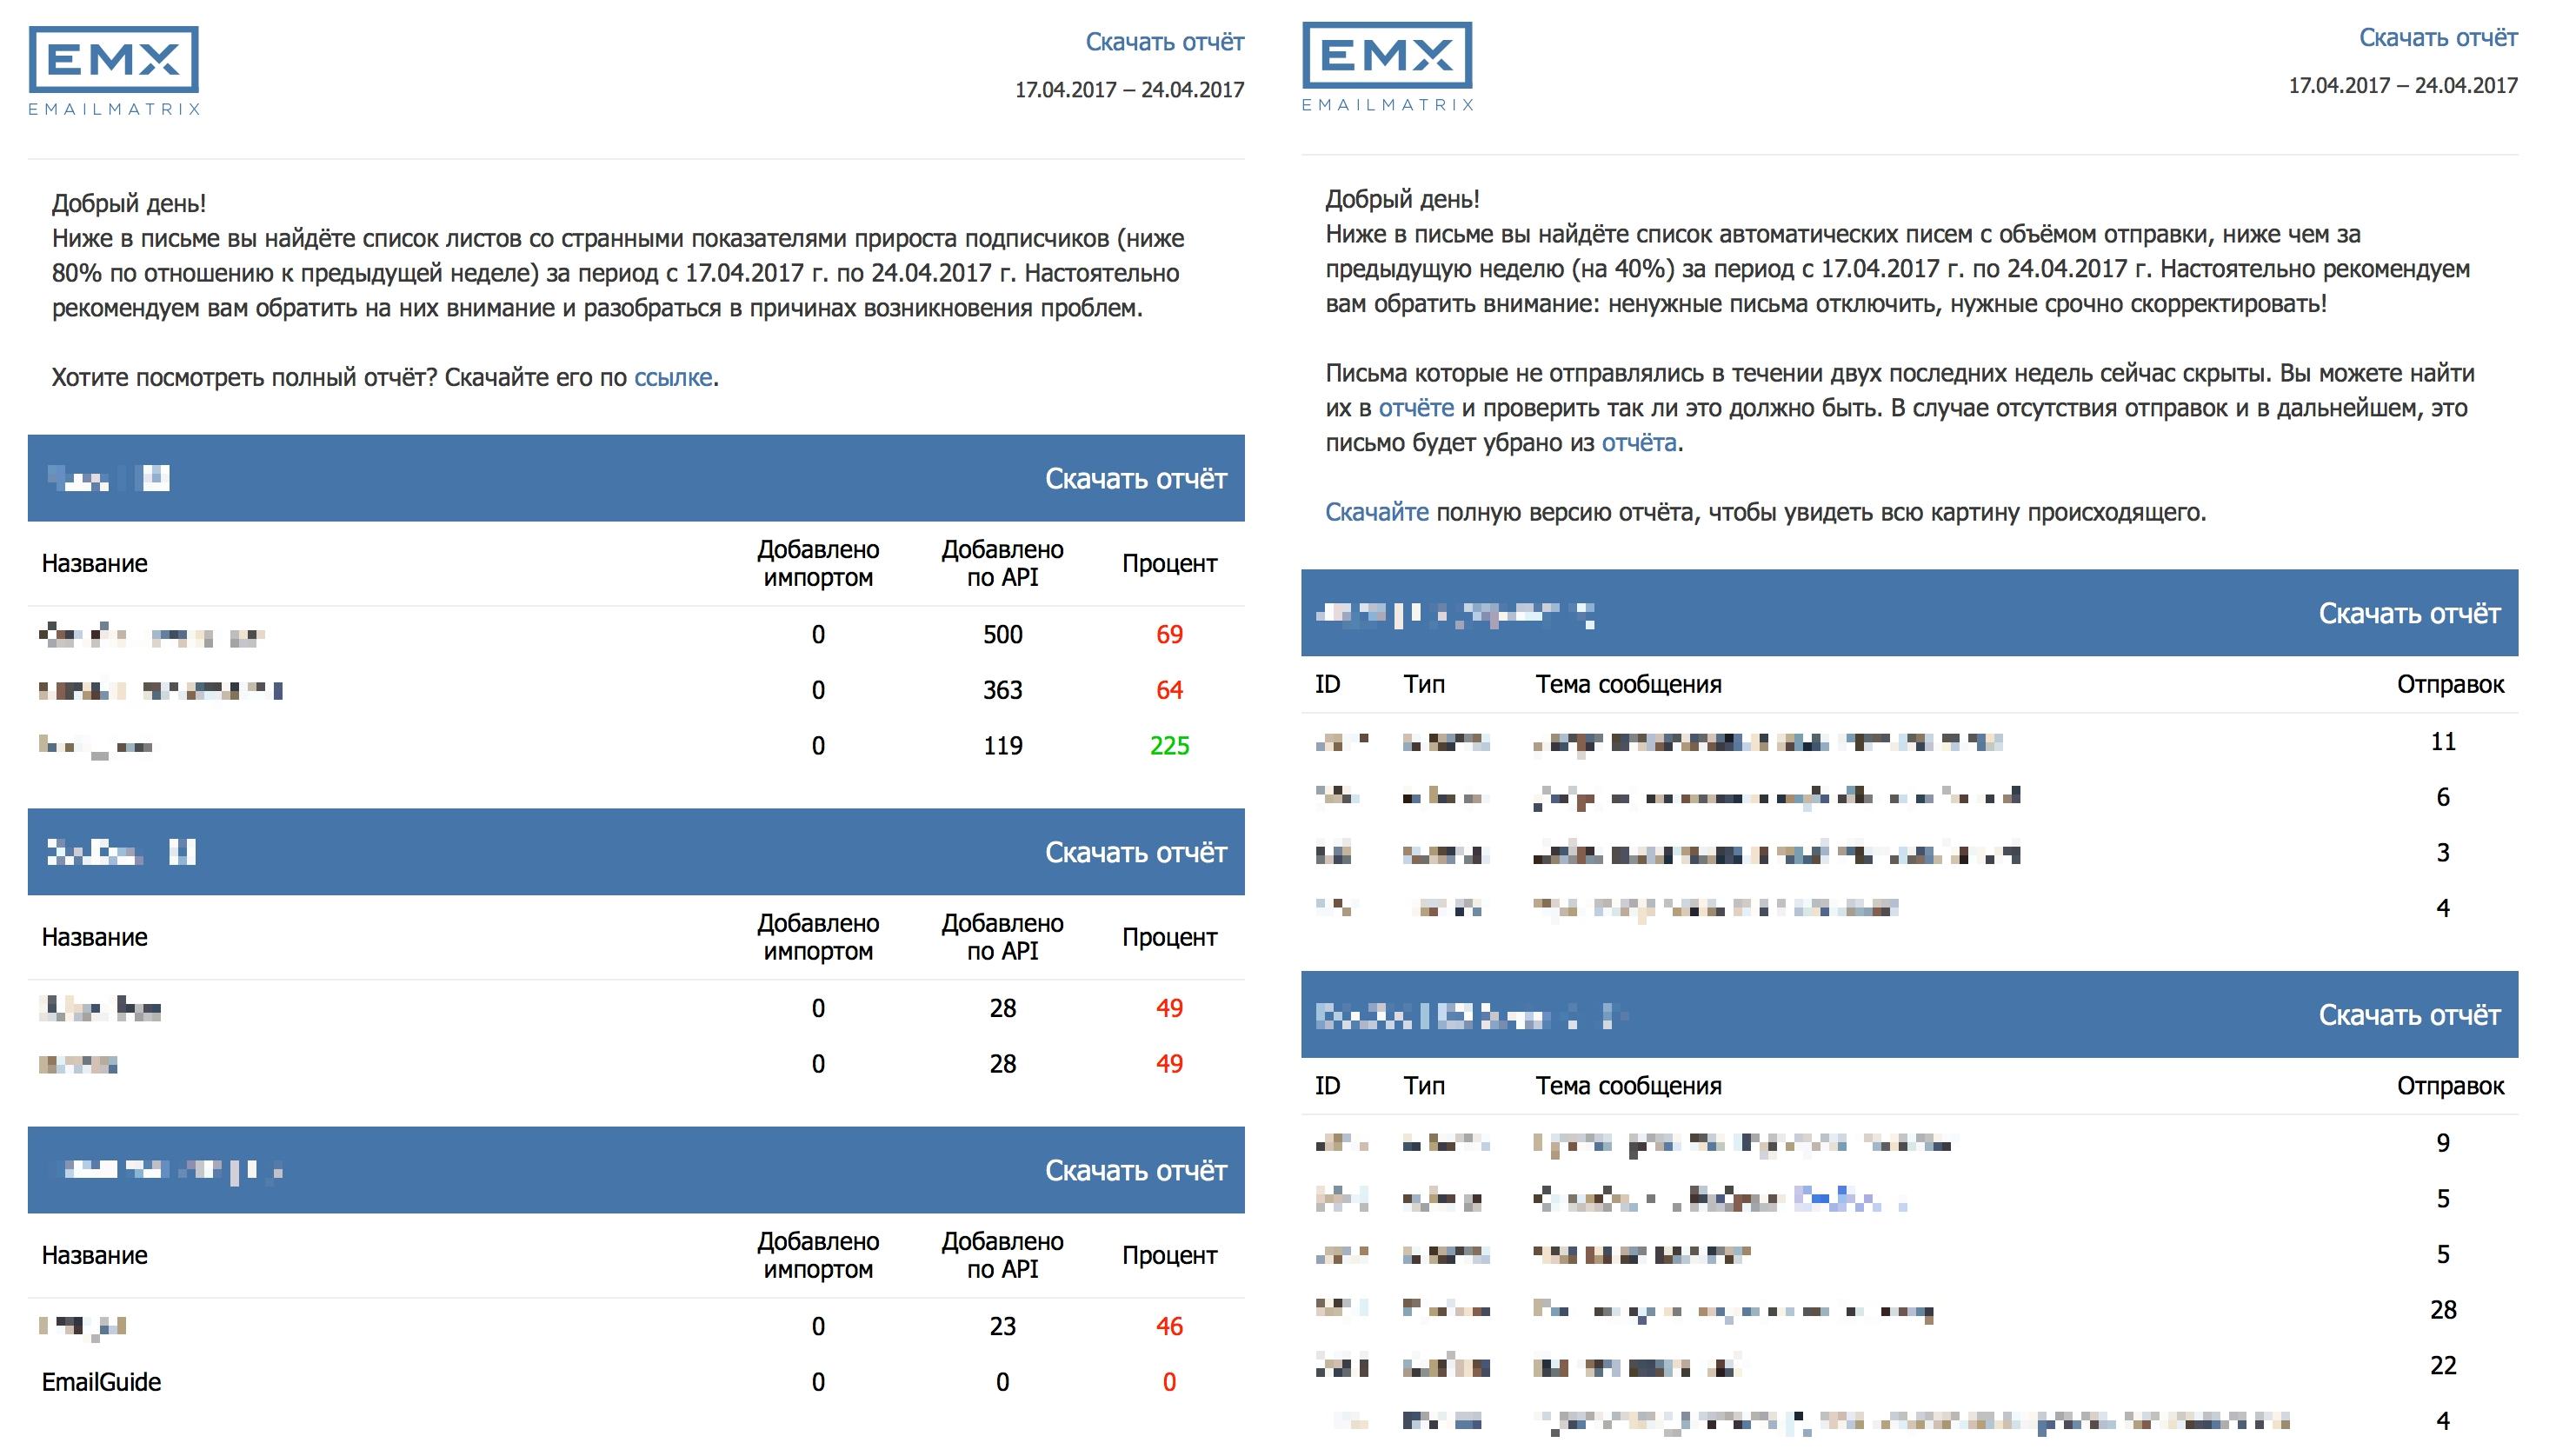 веб-аналитика 2